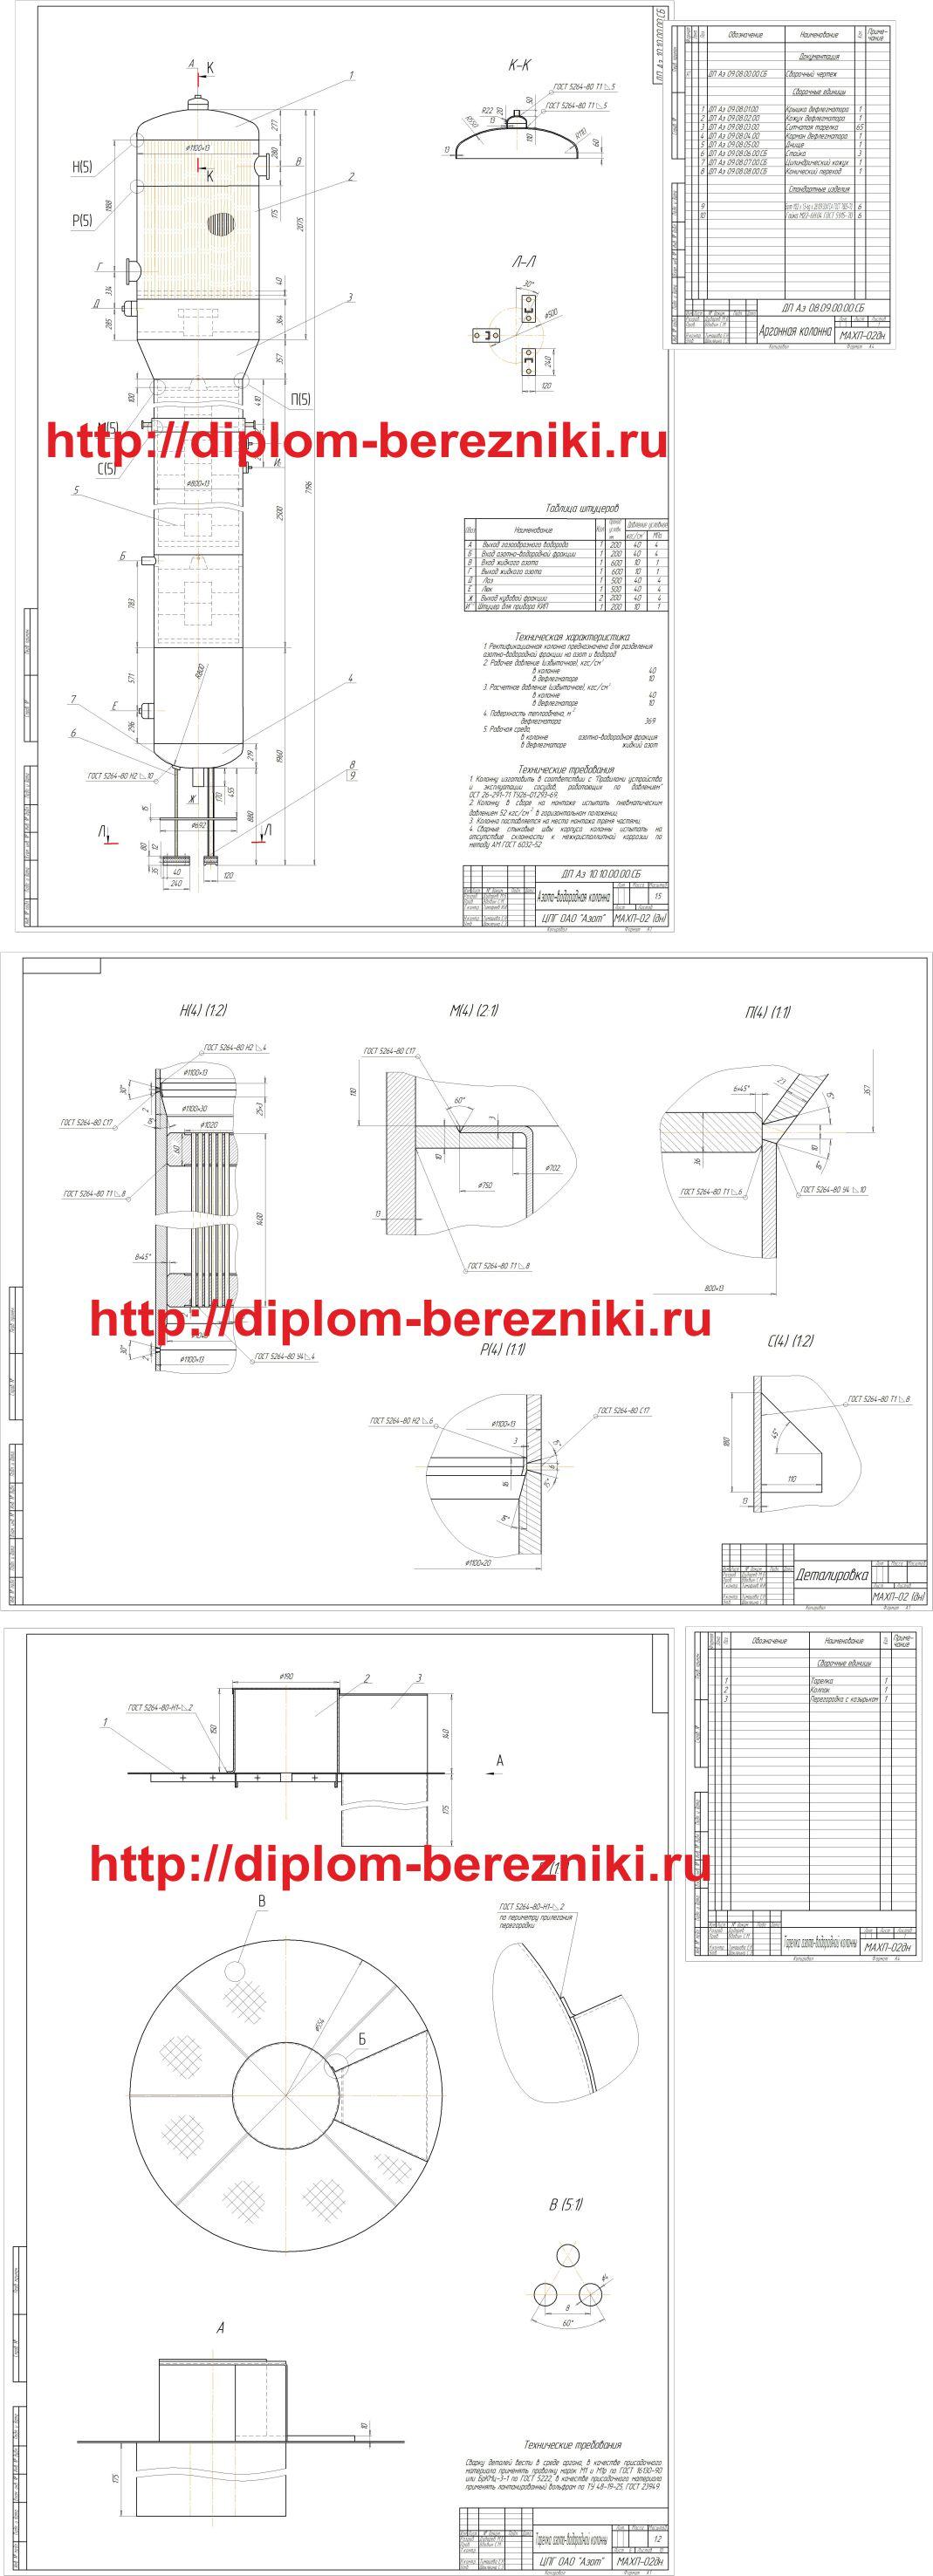 чертеж азотно-водородная ректификационная колонна